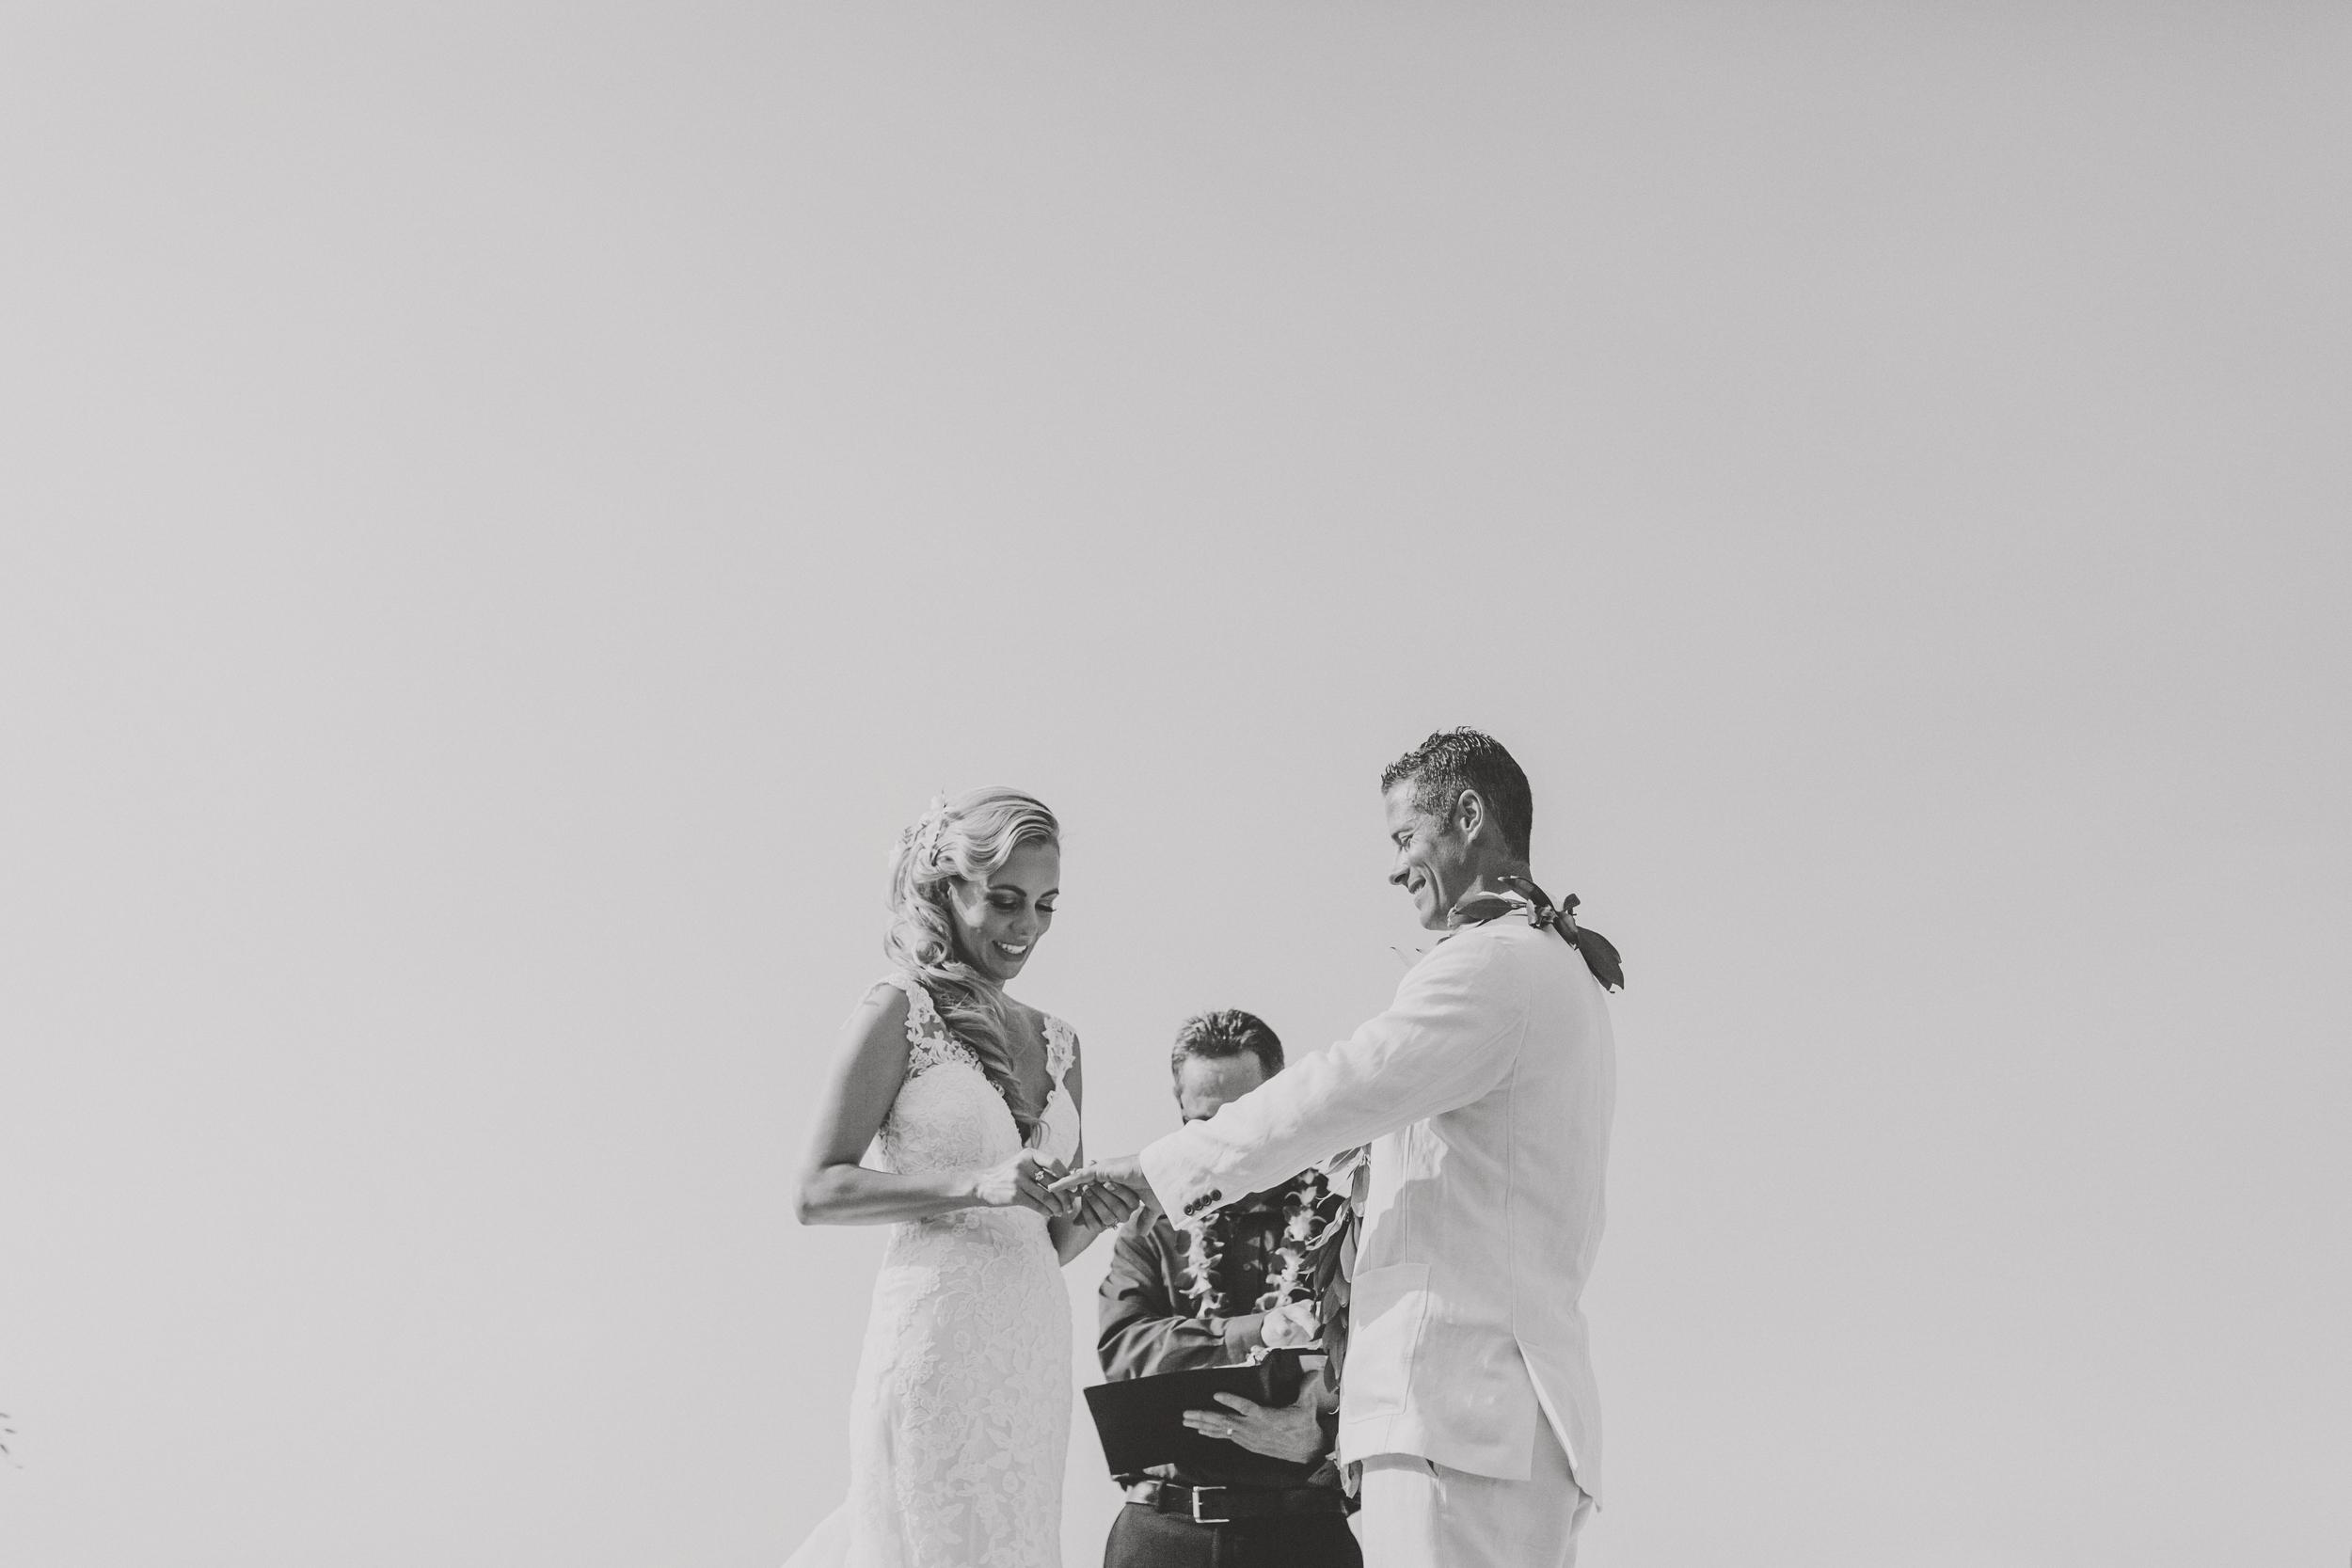 angie-diaz-photography-hawaii-wedding-photographer-kelli-jay-74.jpg